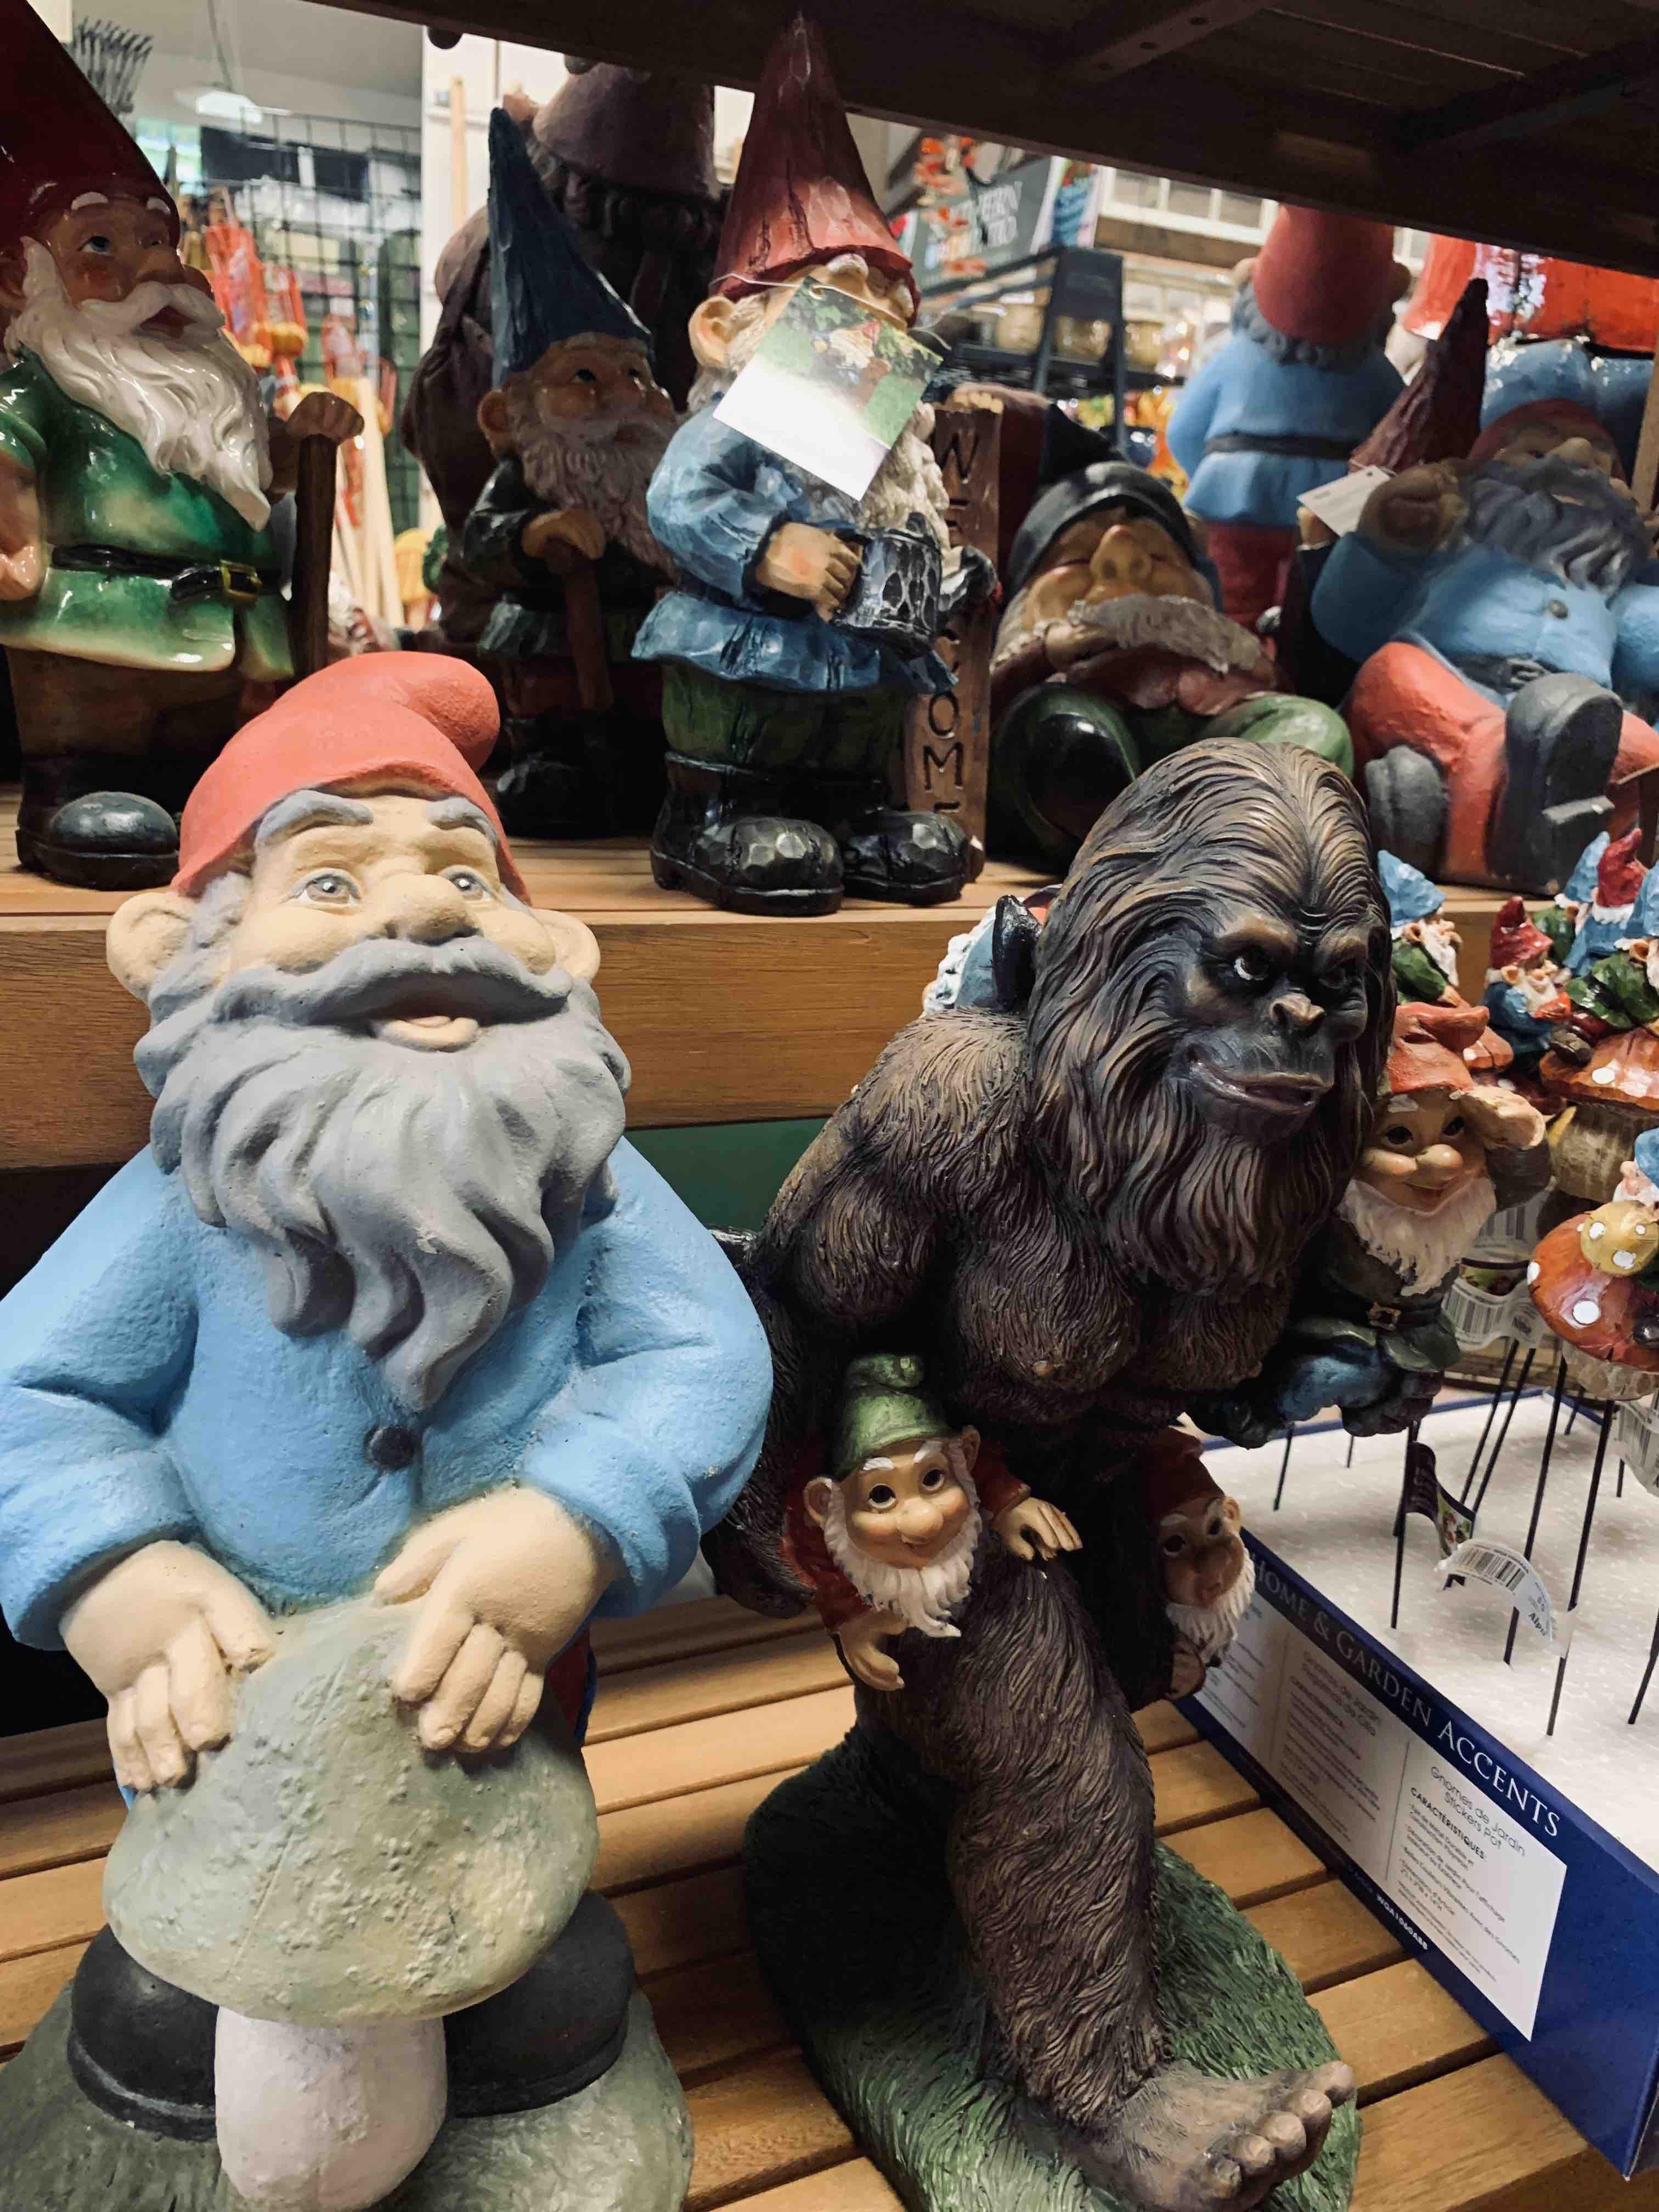 Bigfoot with gnomes